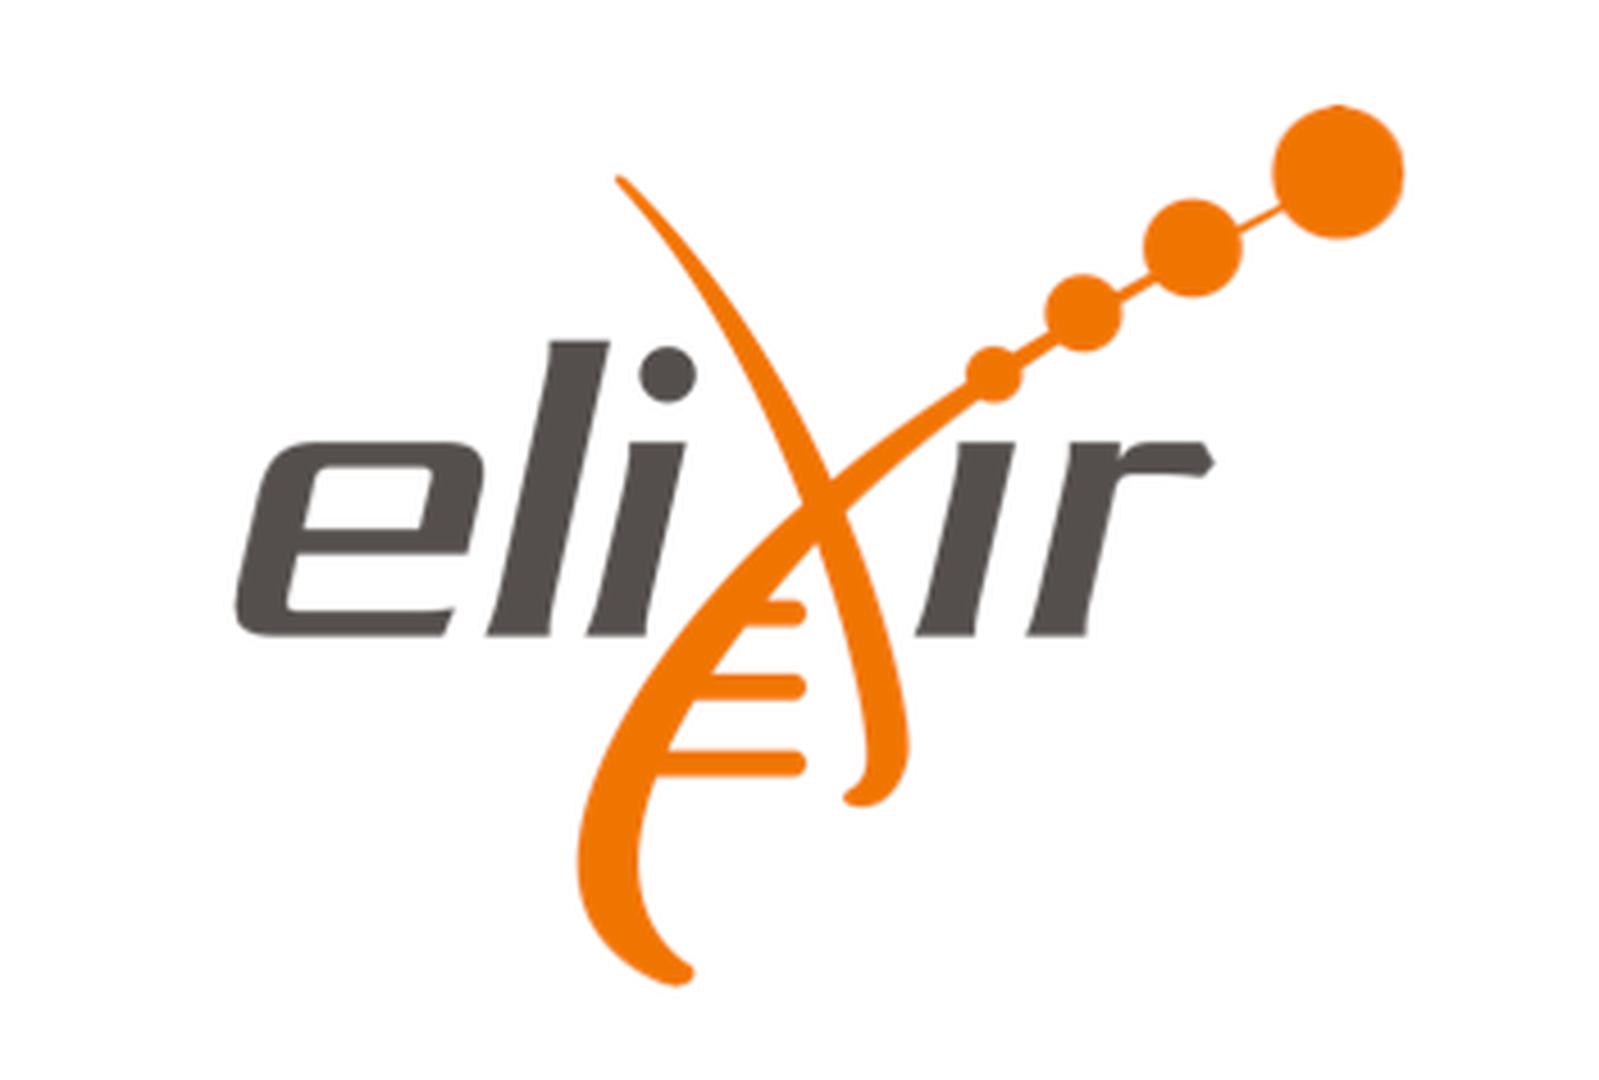 https://www.npec.nl/wp-content/uploads/2019/05/ELIXIR-logo-vierkant.png